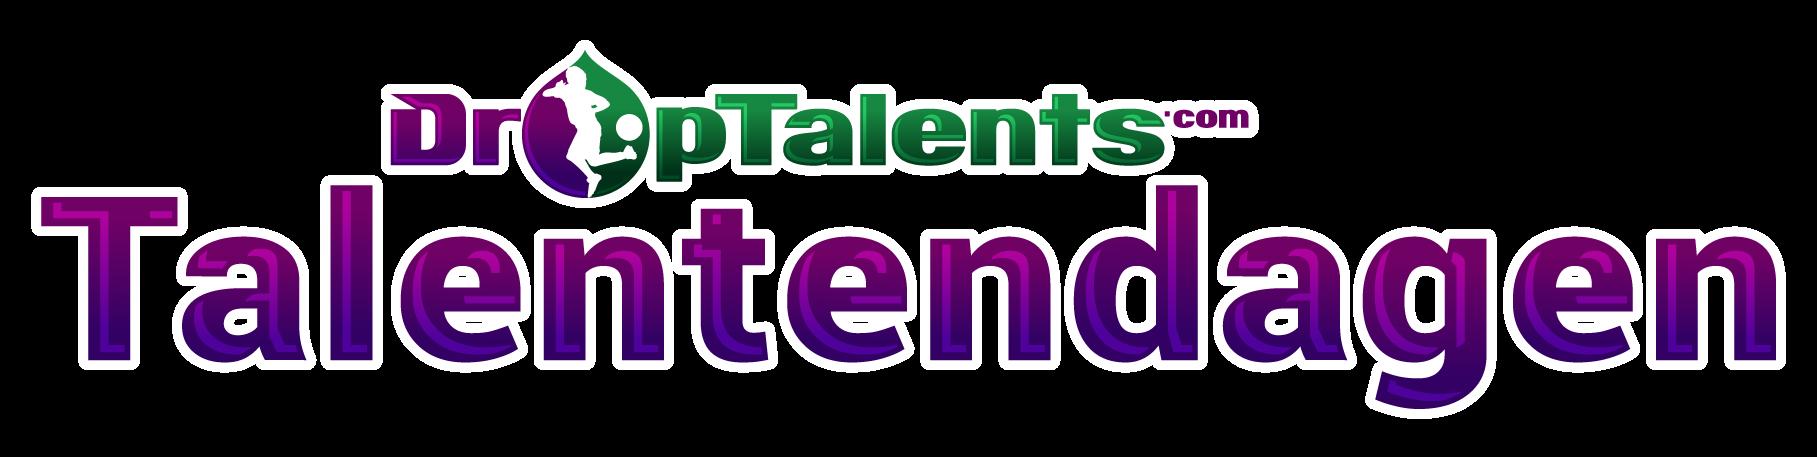 talentendagen